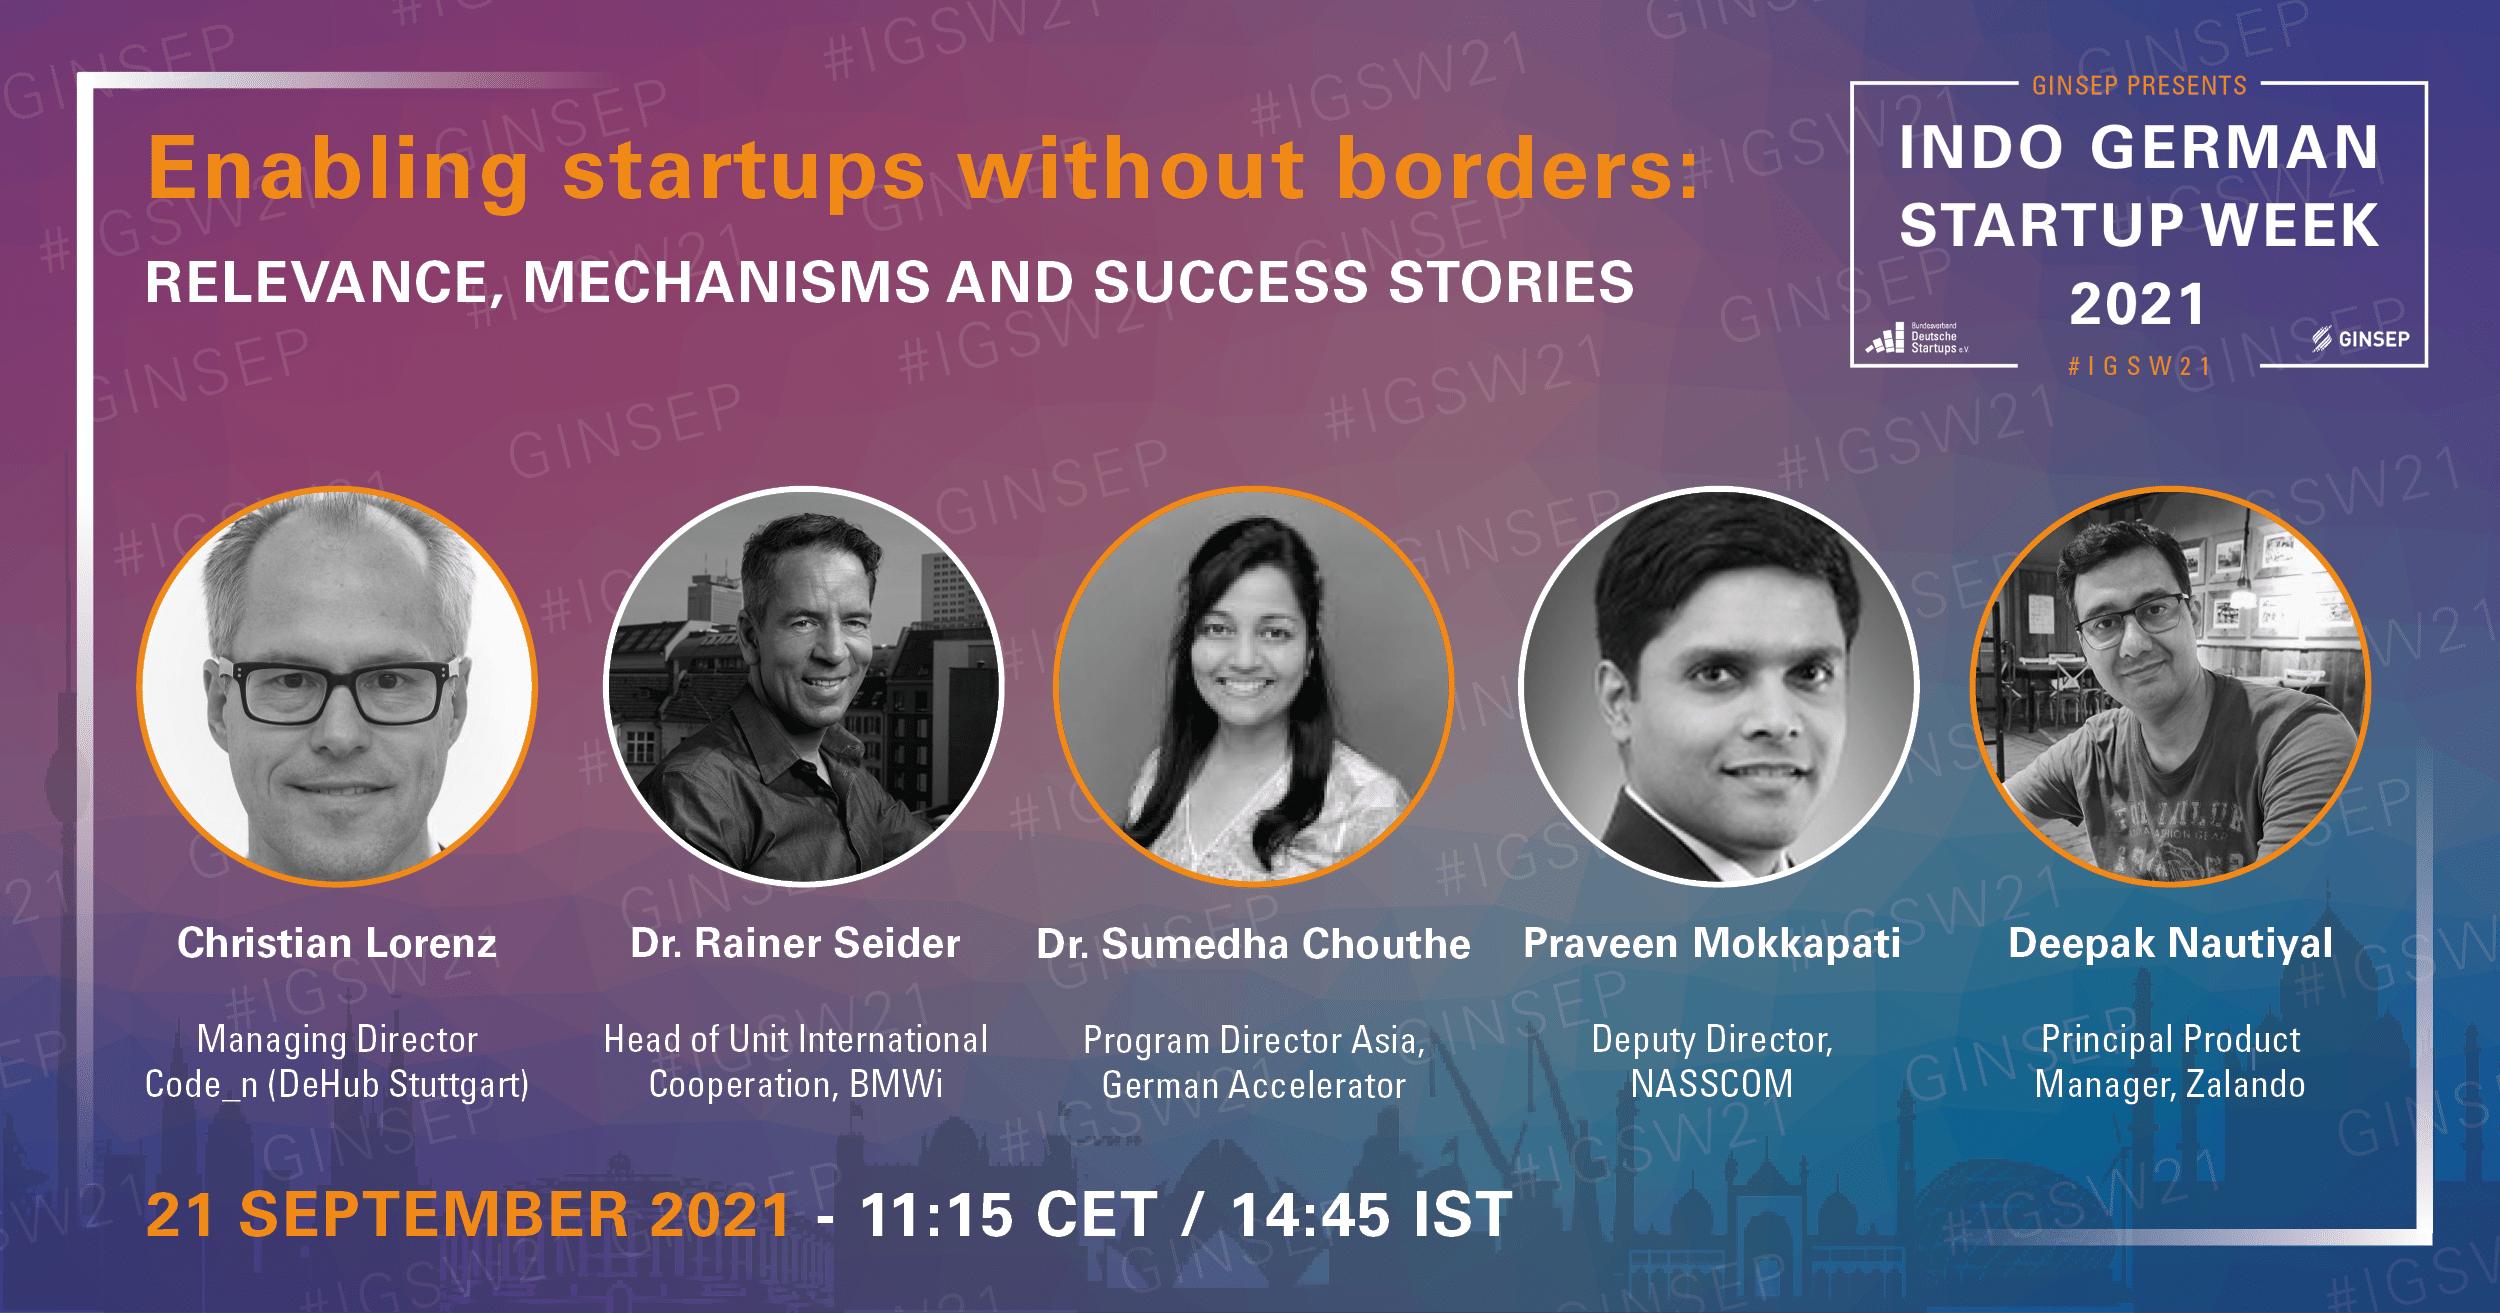 Enabling Startups without Borders, Indo German Startup Week, CODE_n, Startup, Innovation, Industrie 4.0